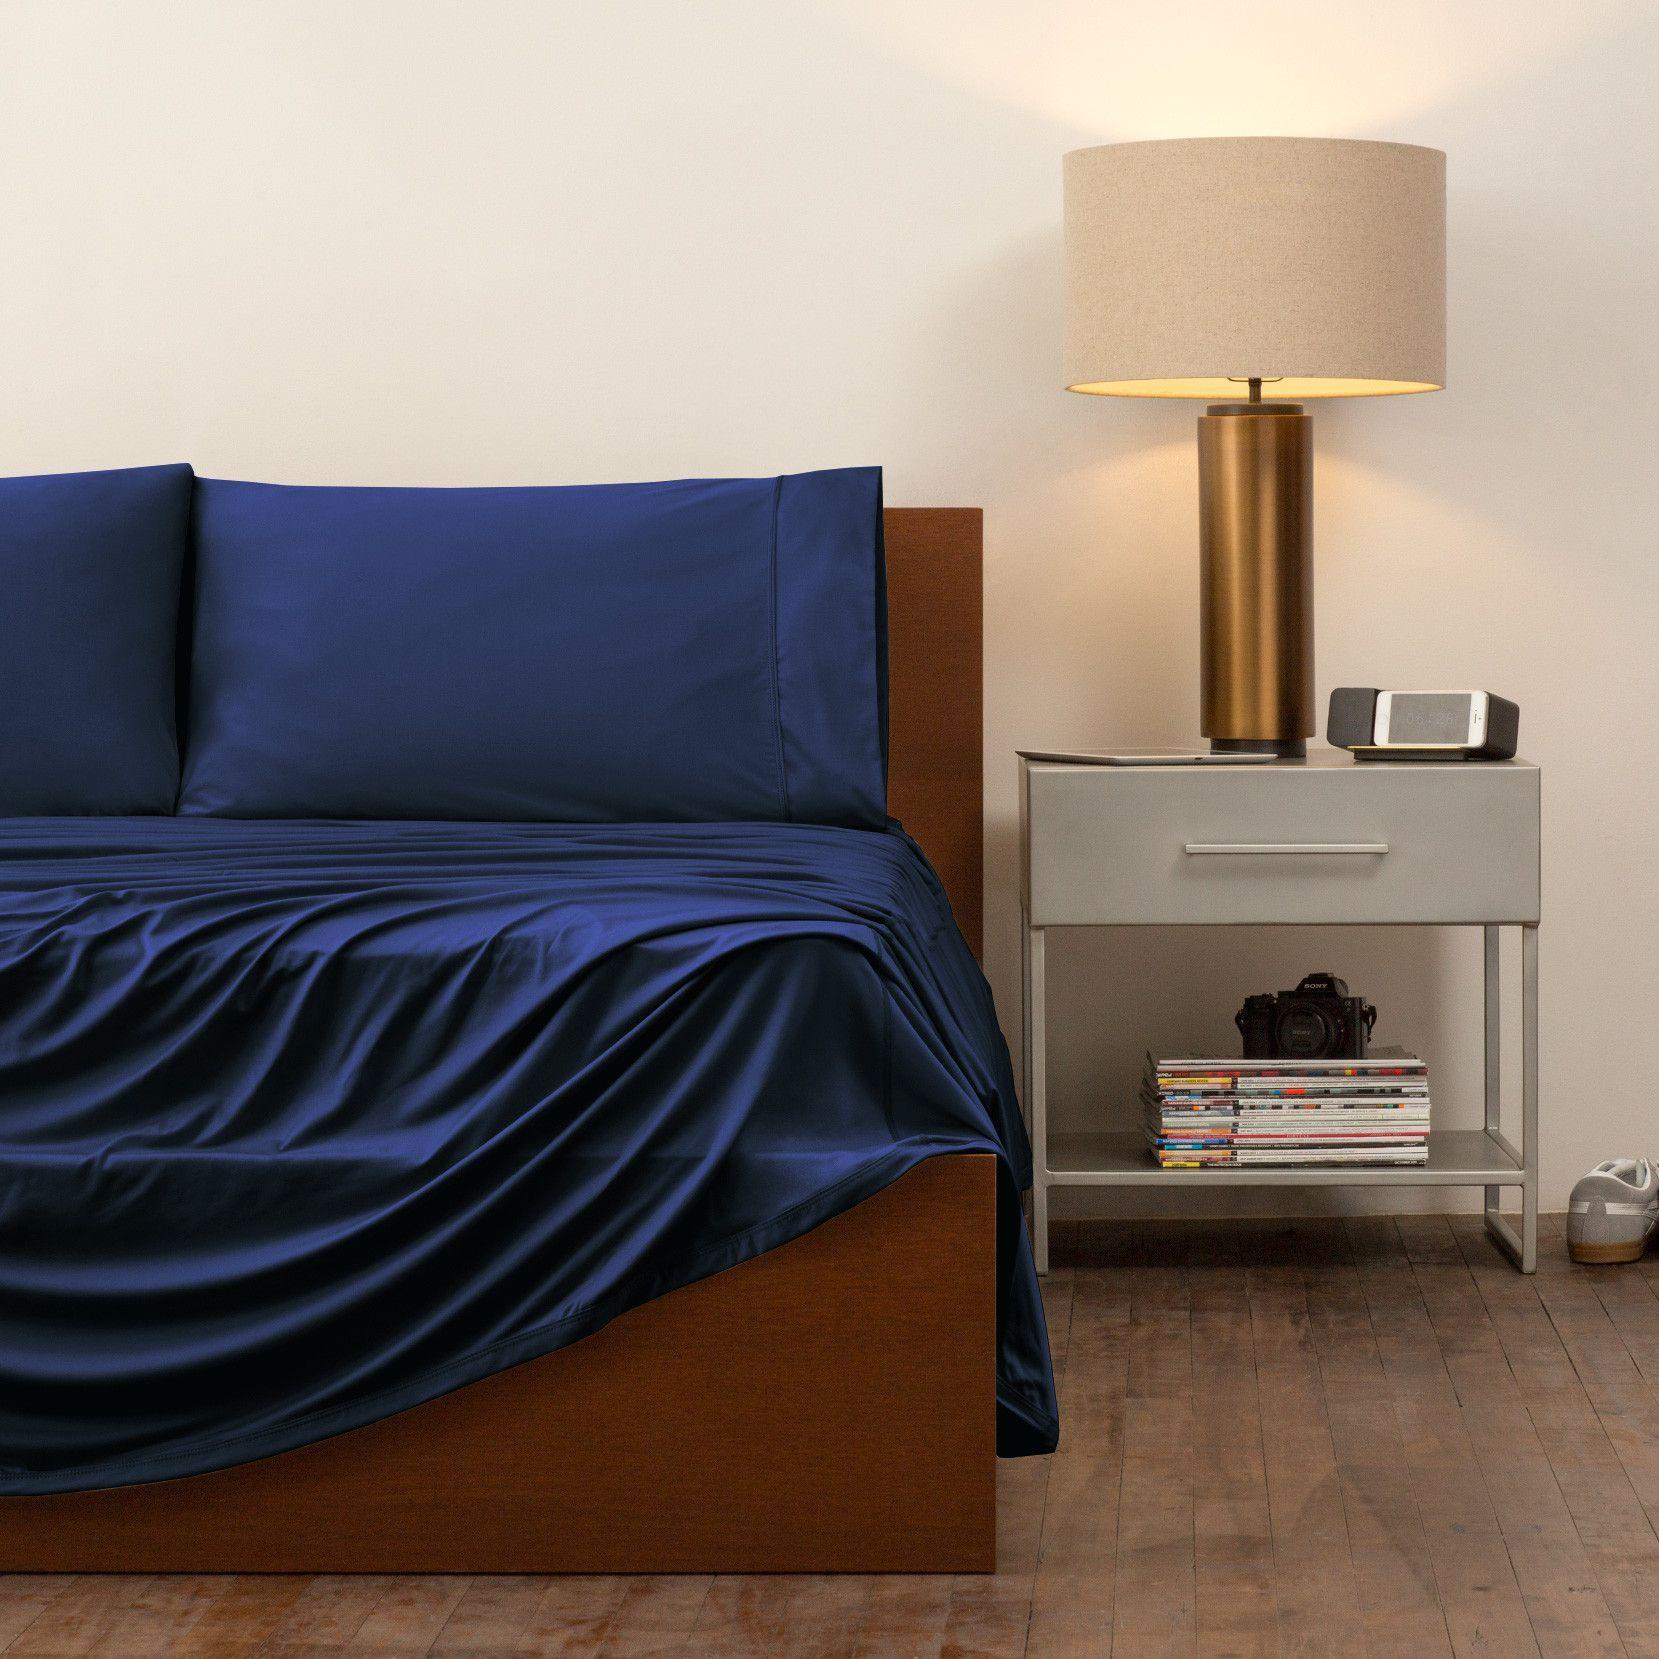 Performance Sheet Set Best Cooling Sheets King Sheet Sets Traditional Bed Sheets